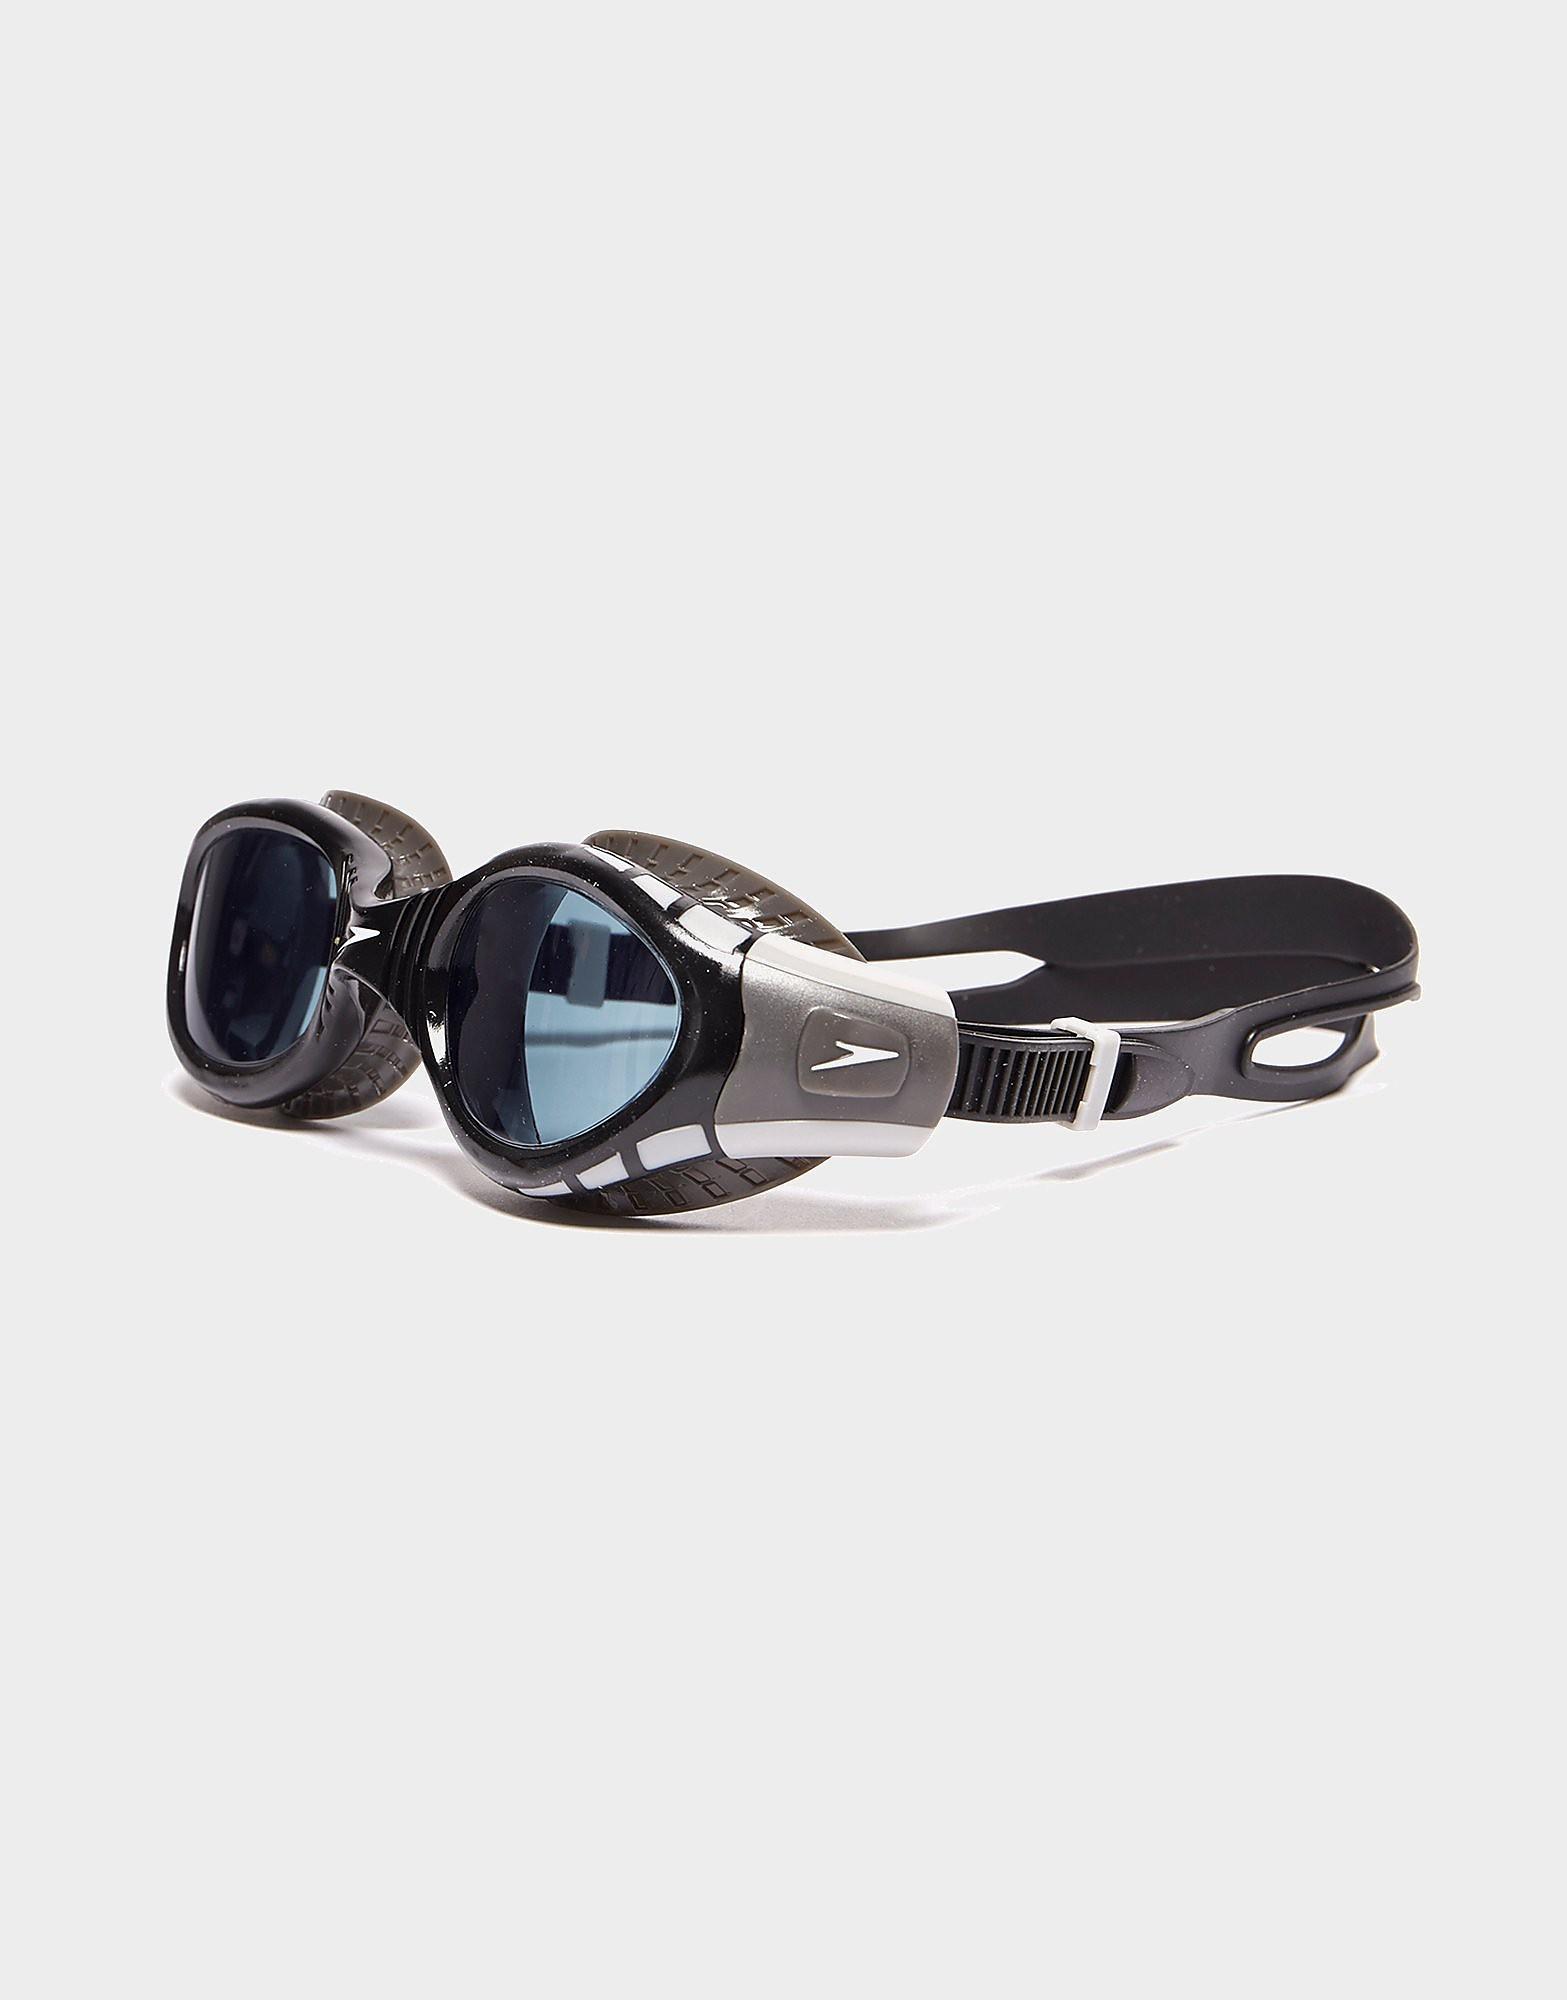 Speedo Futura Biofuse Flexiseal Goggles